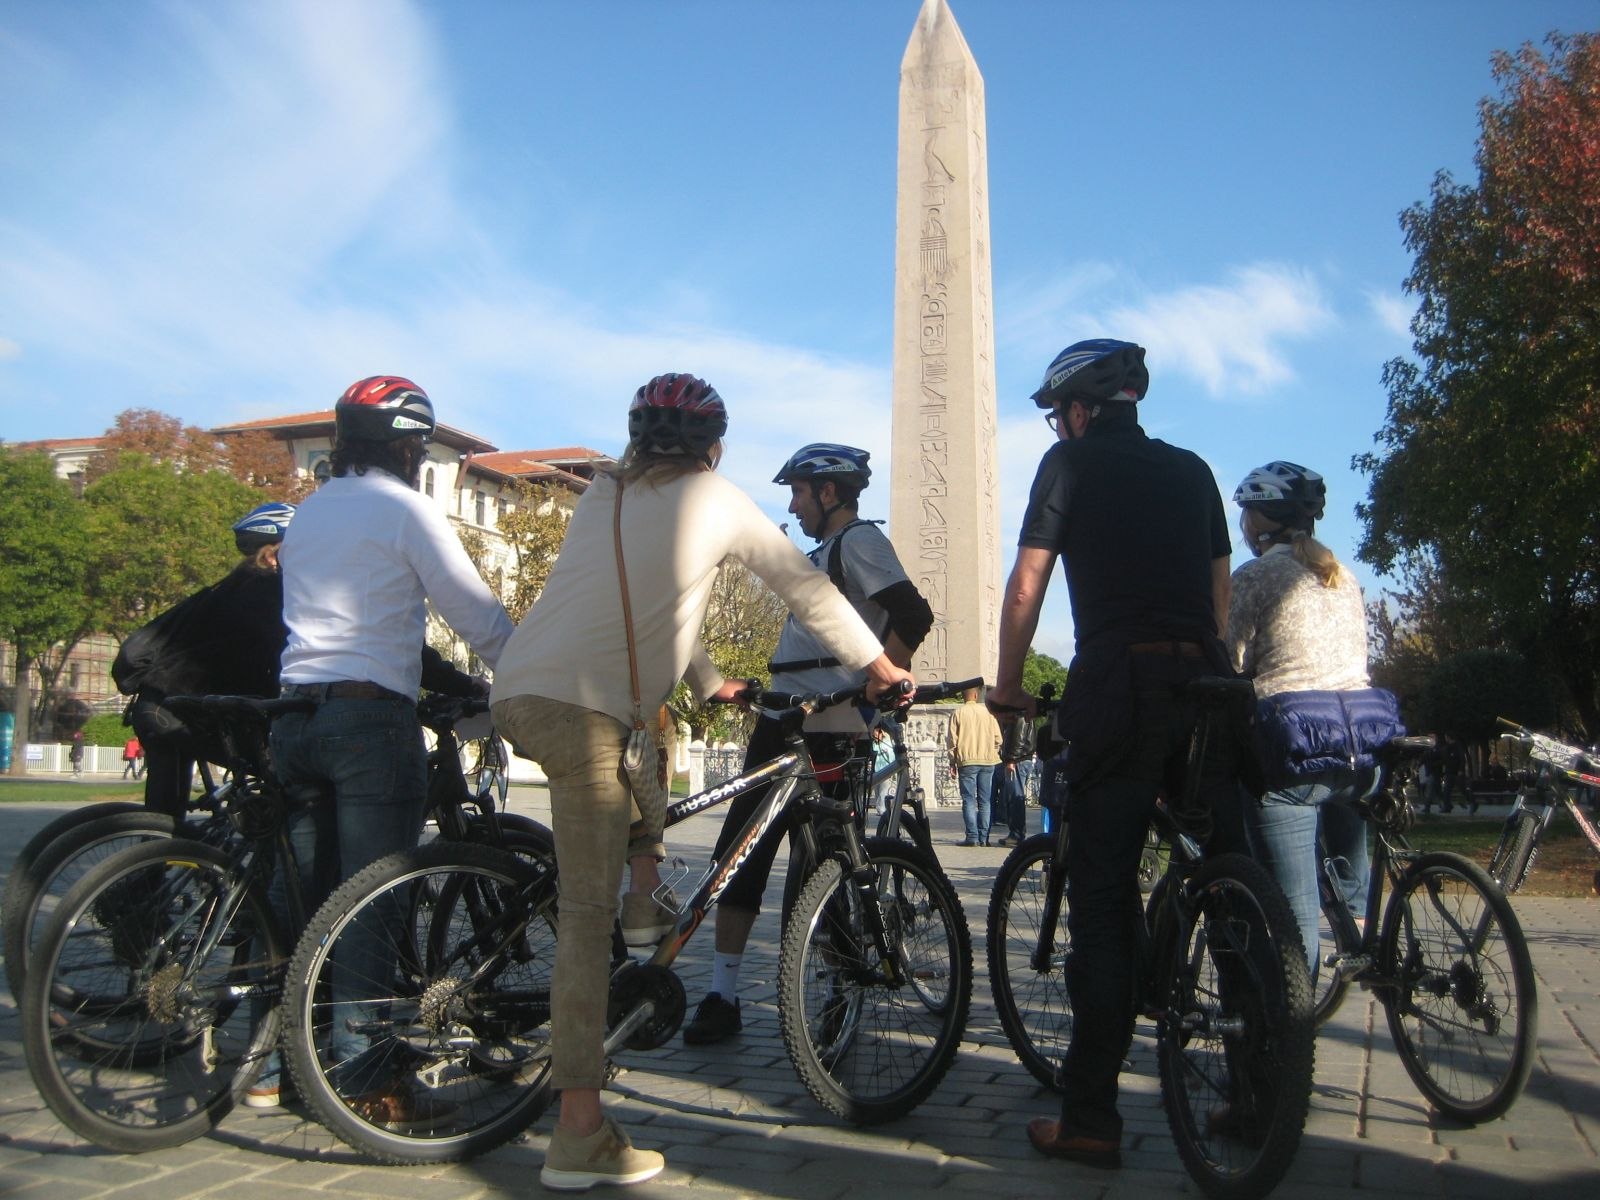 Egyptian Obelisk Old City Bike Tour